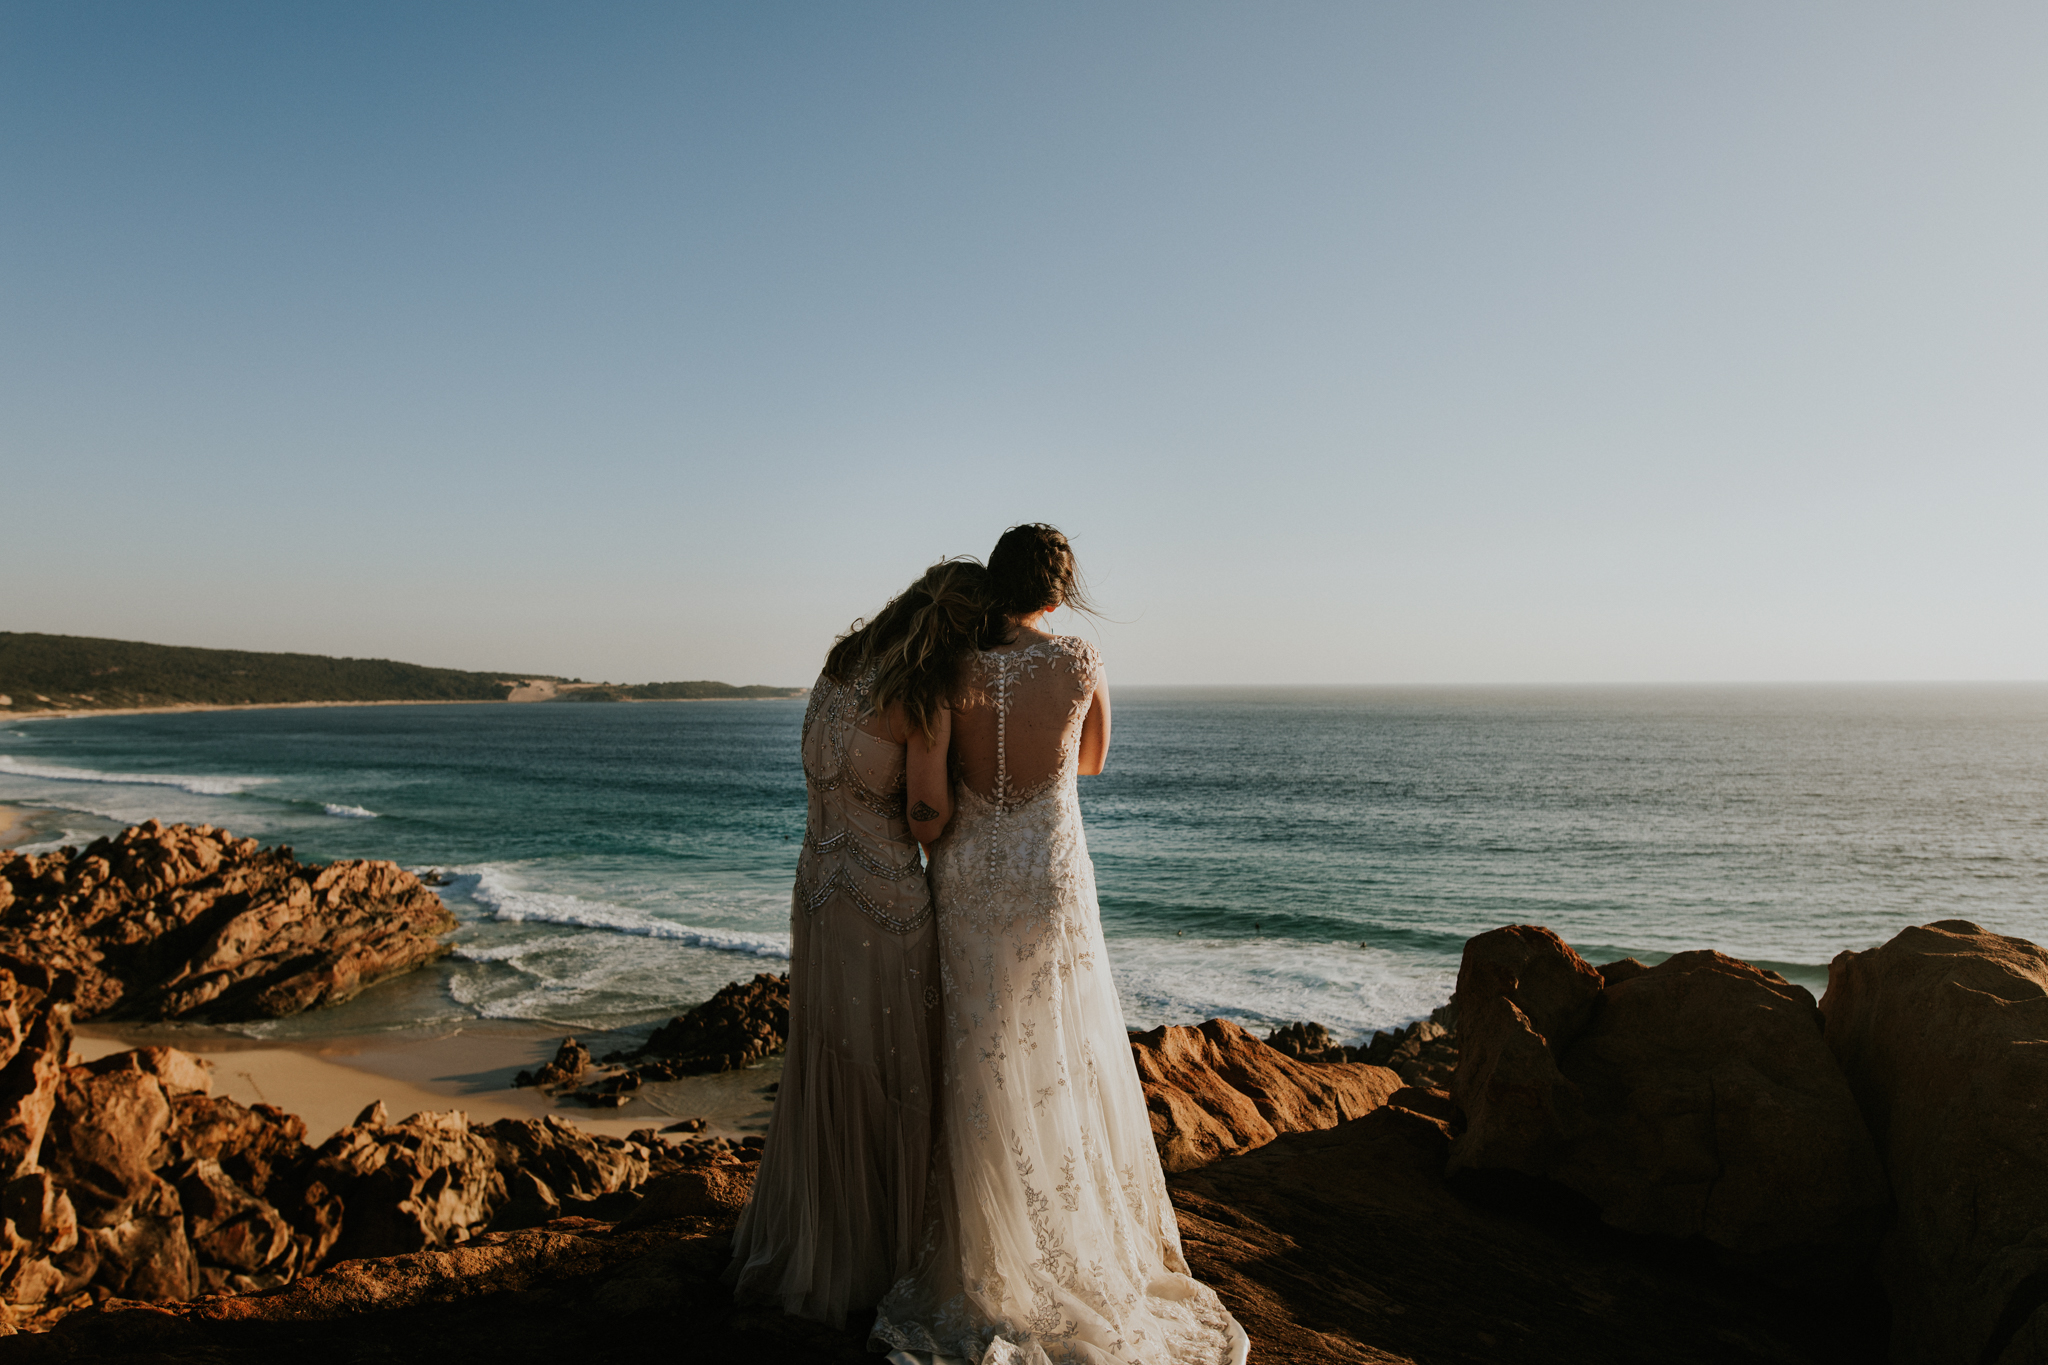 Catie + Jessica | Western Australia | Elopement Photo + Video